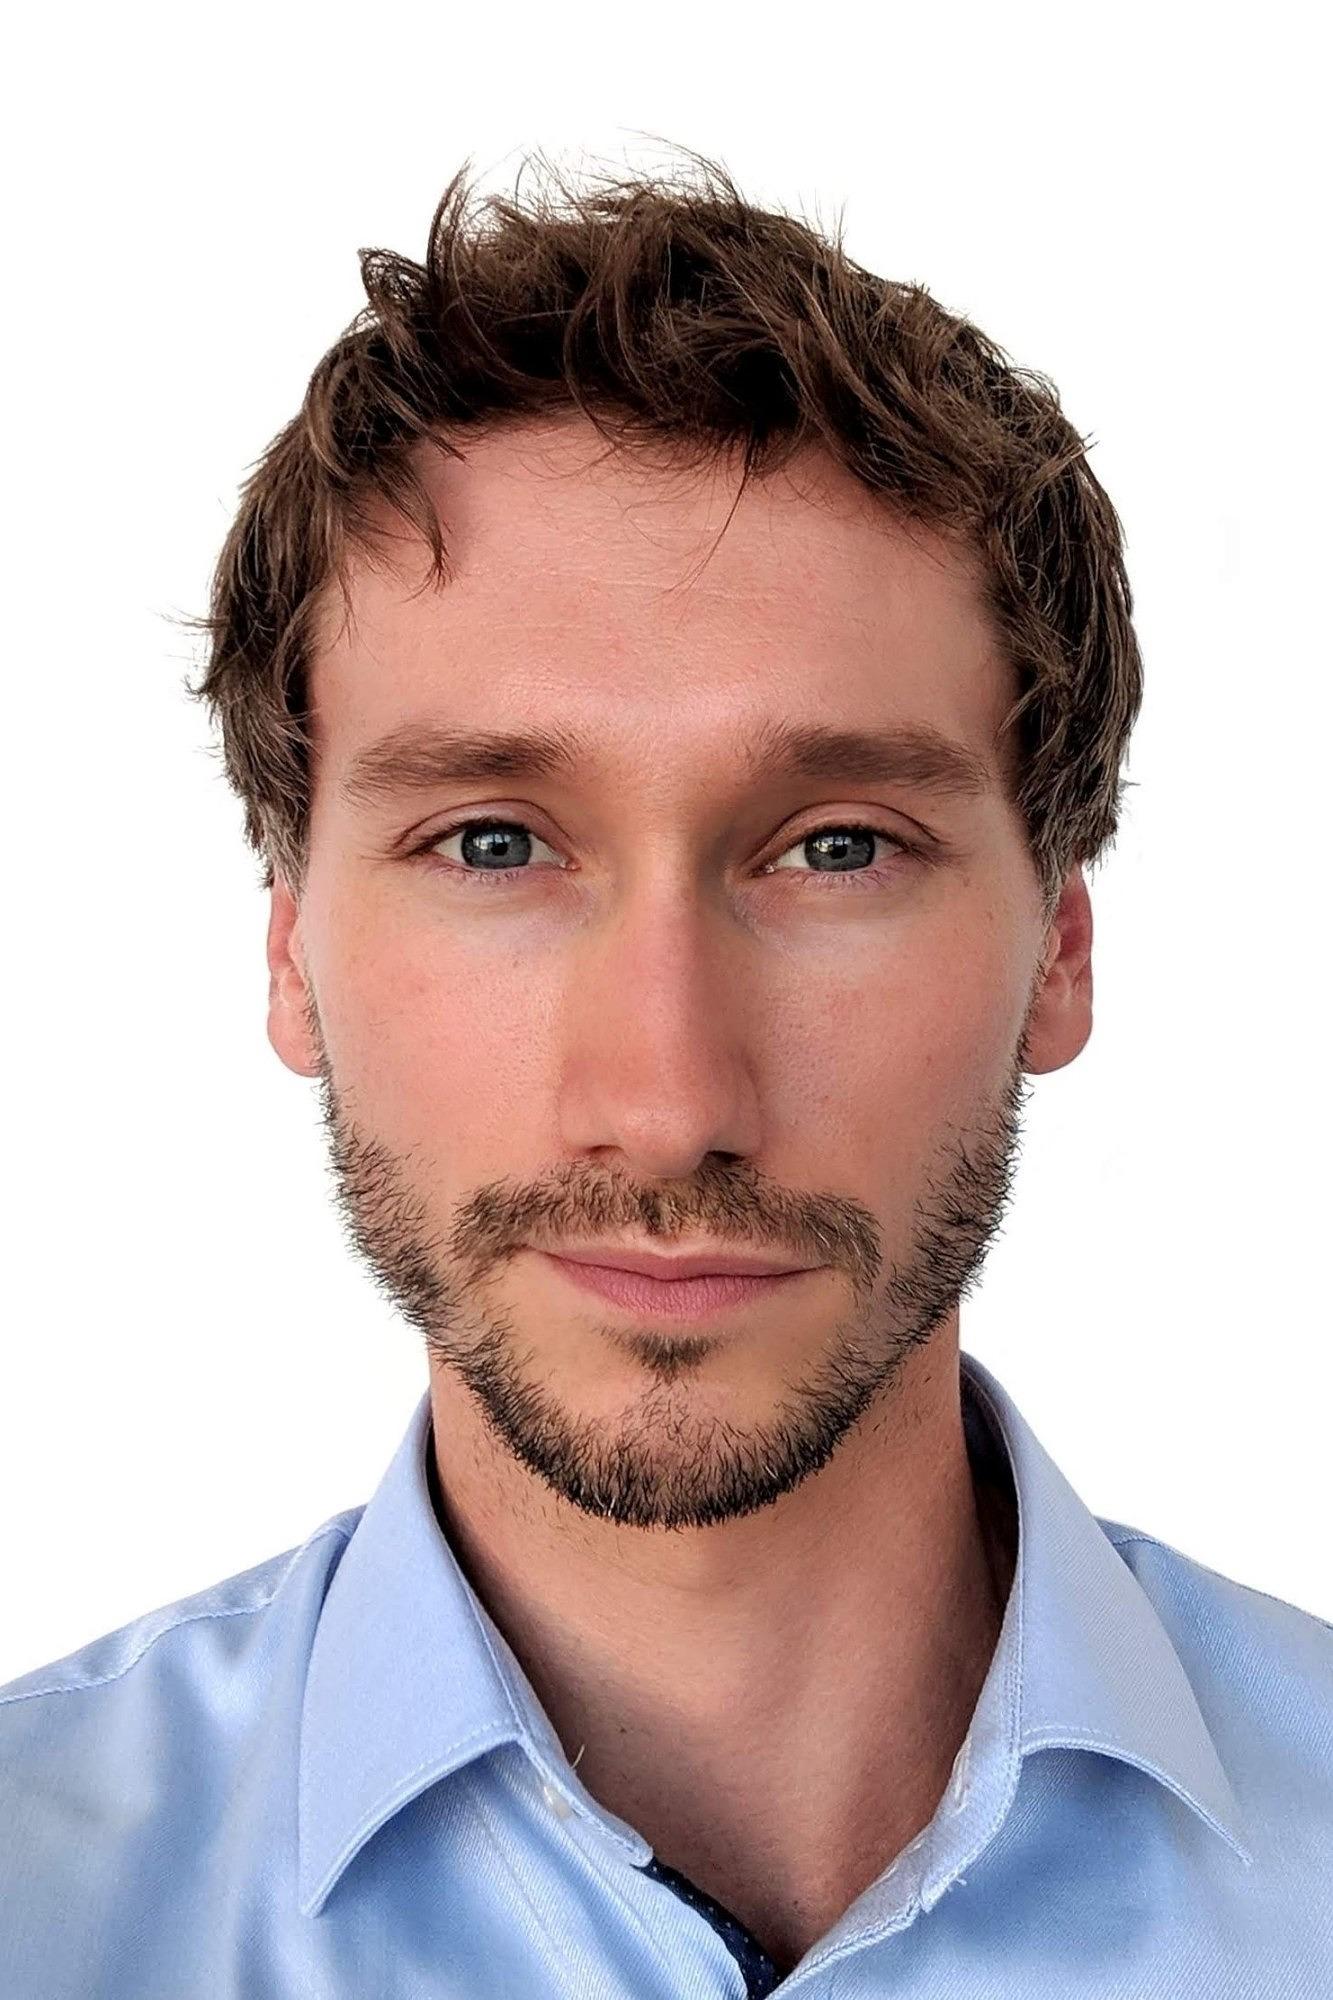 Dr.-Ing. Oliver Reiche